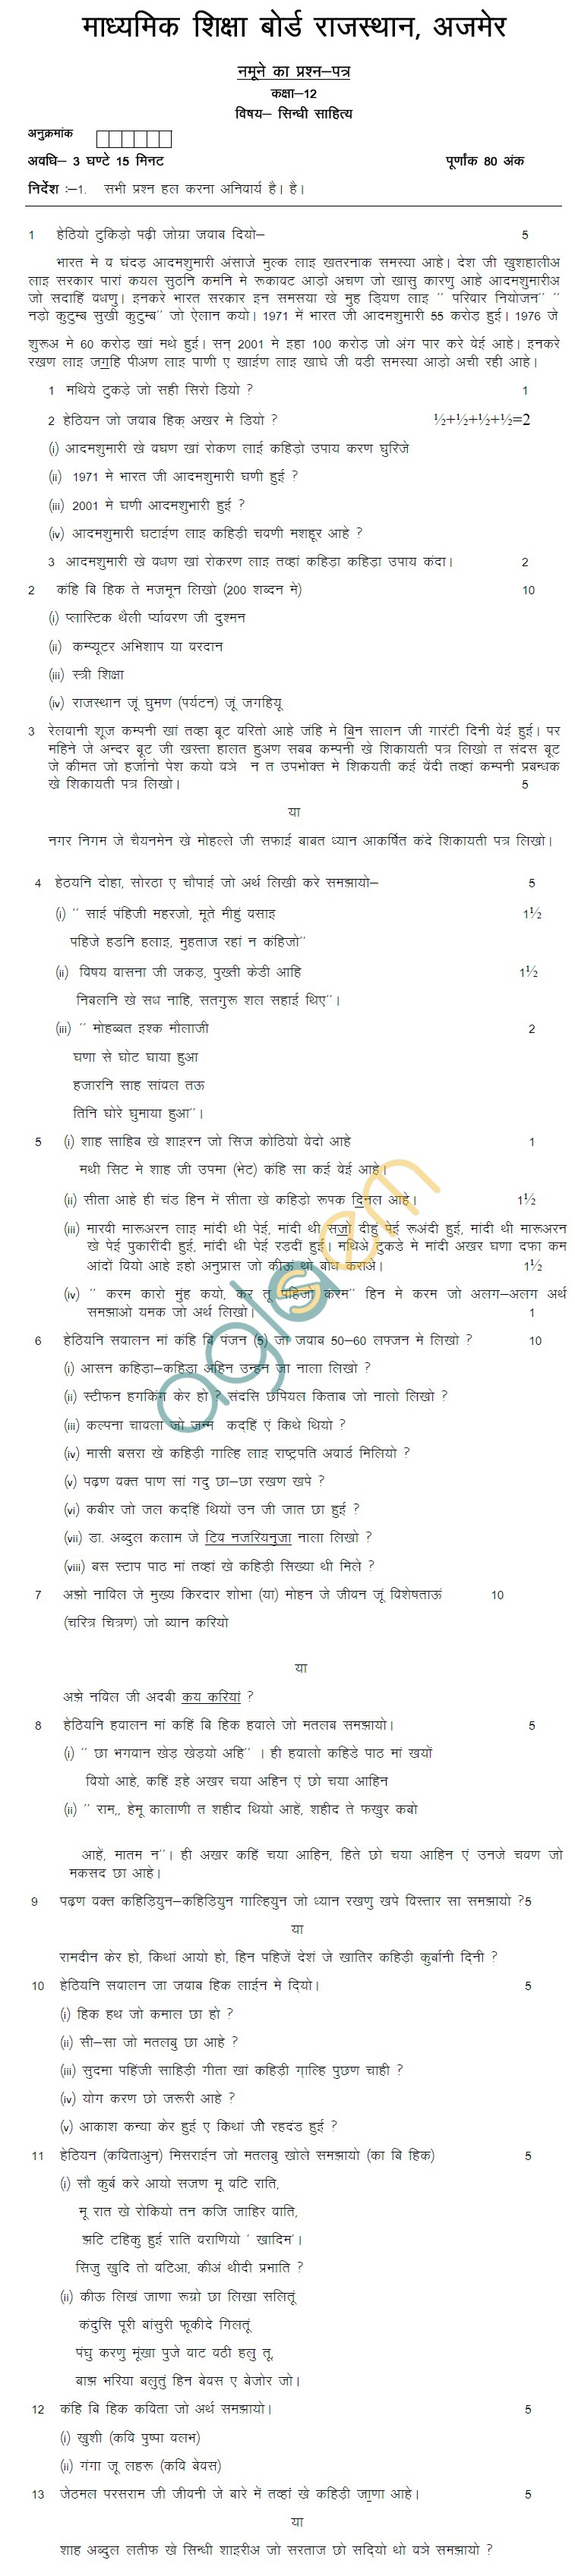 Rajasthan Board Class 12 Shindhi Sahitya Model Question Paper